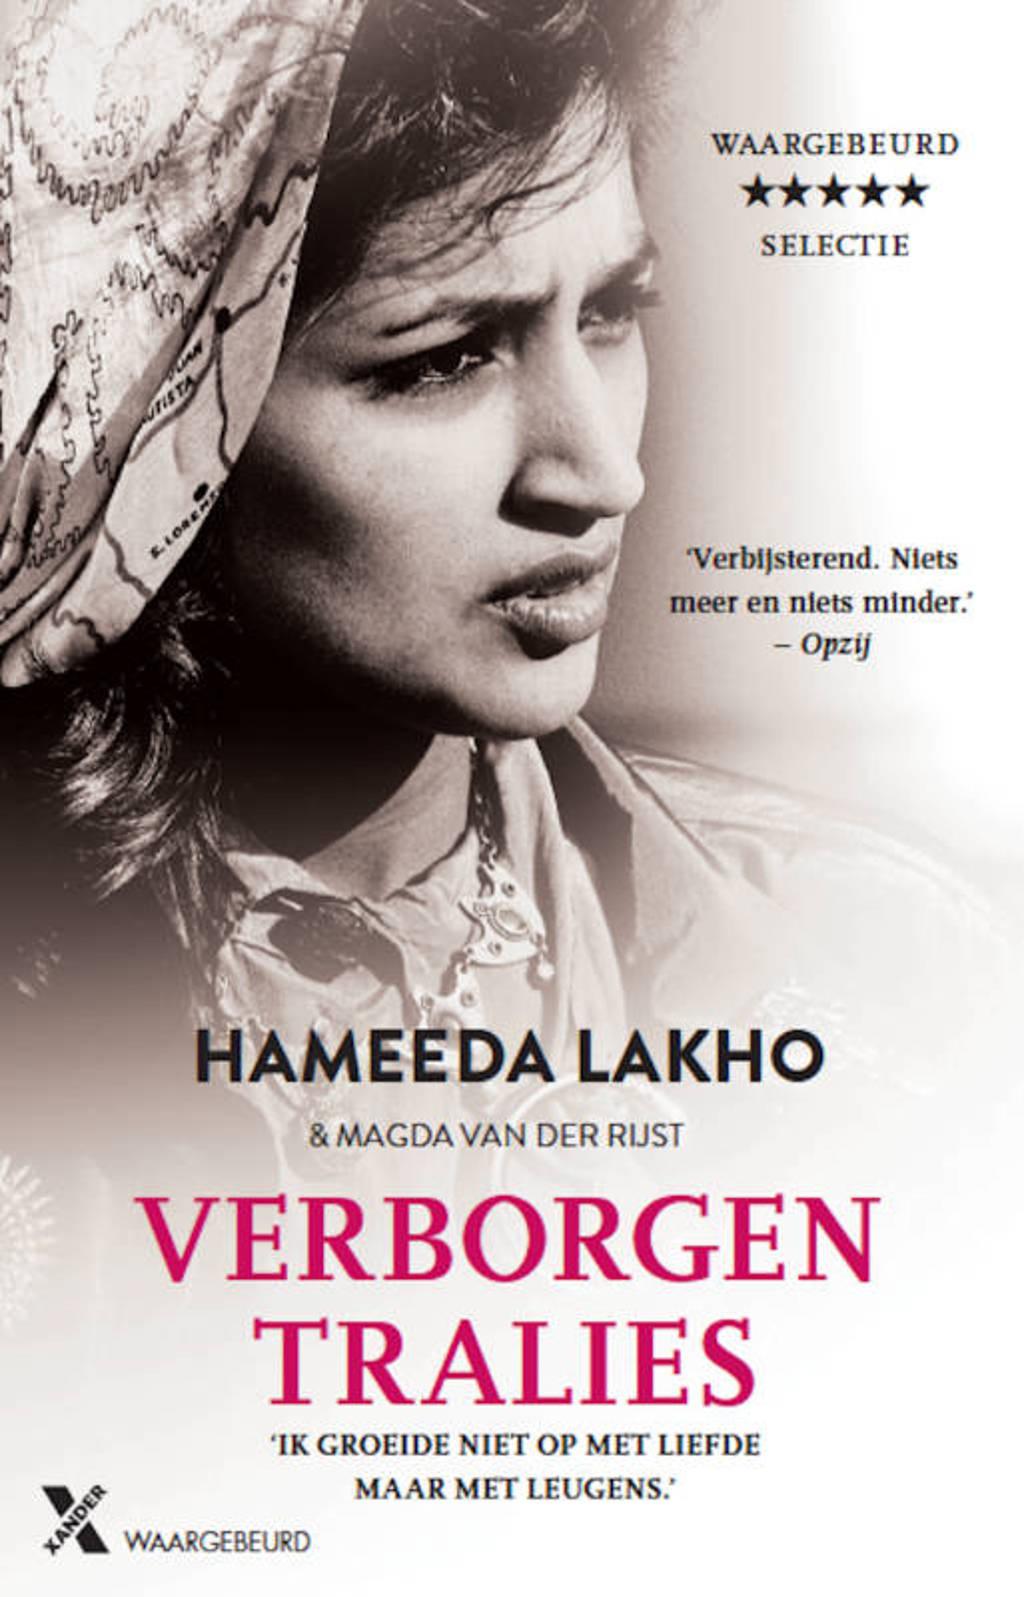 Verborgen Tralies - Hameeda Lakho en Magda van der Rijst